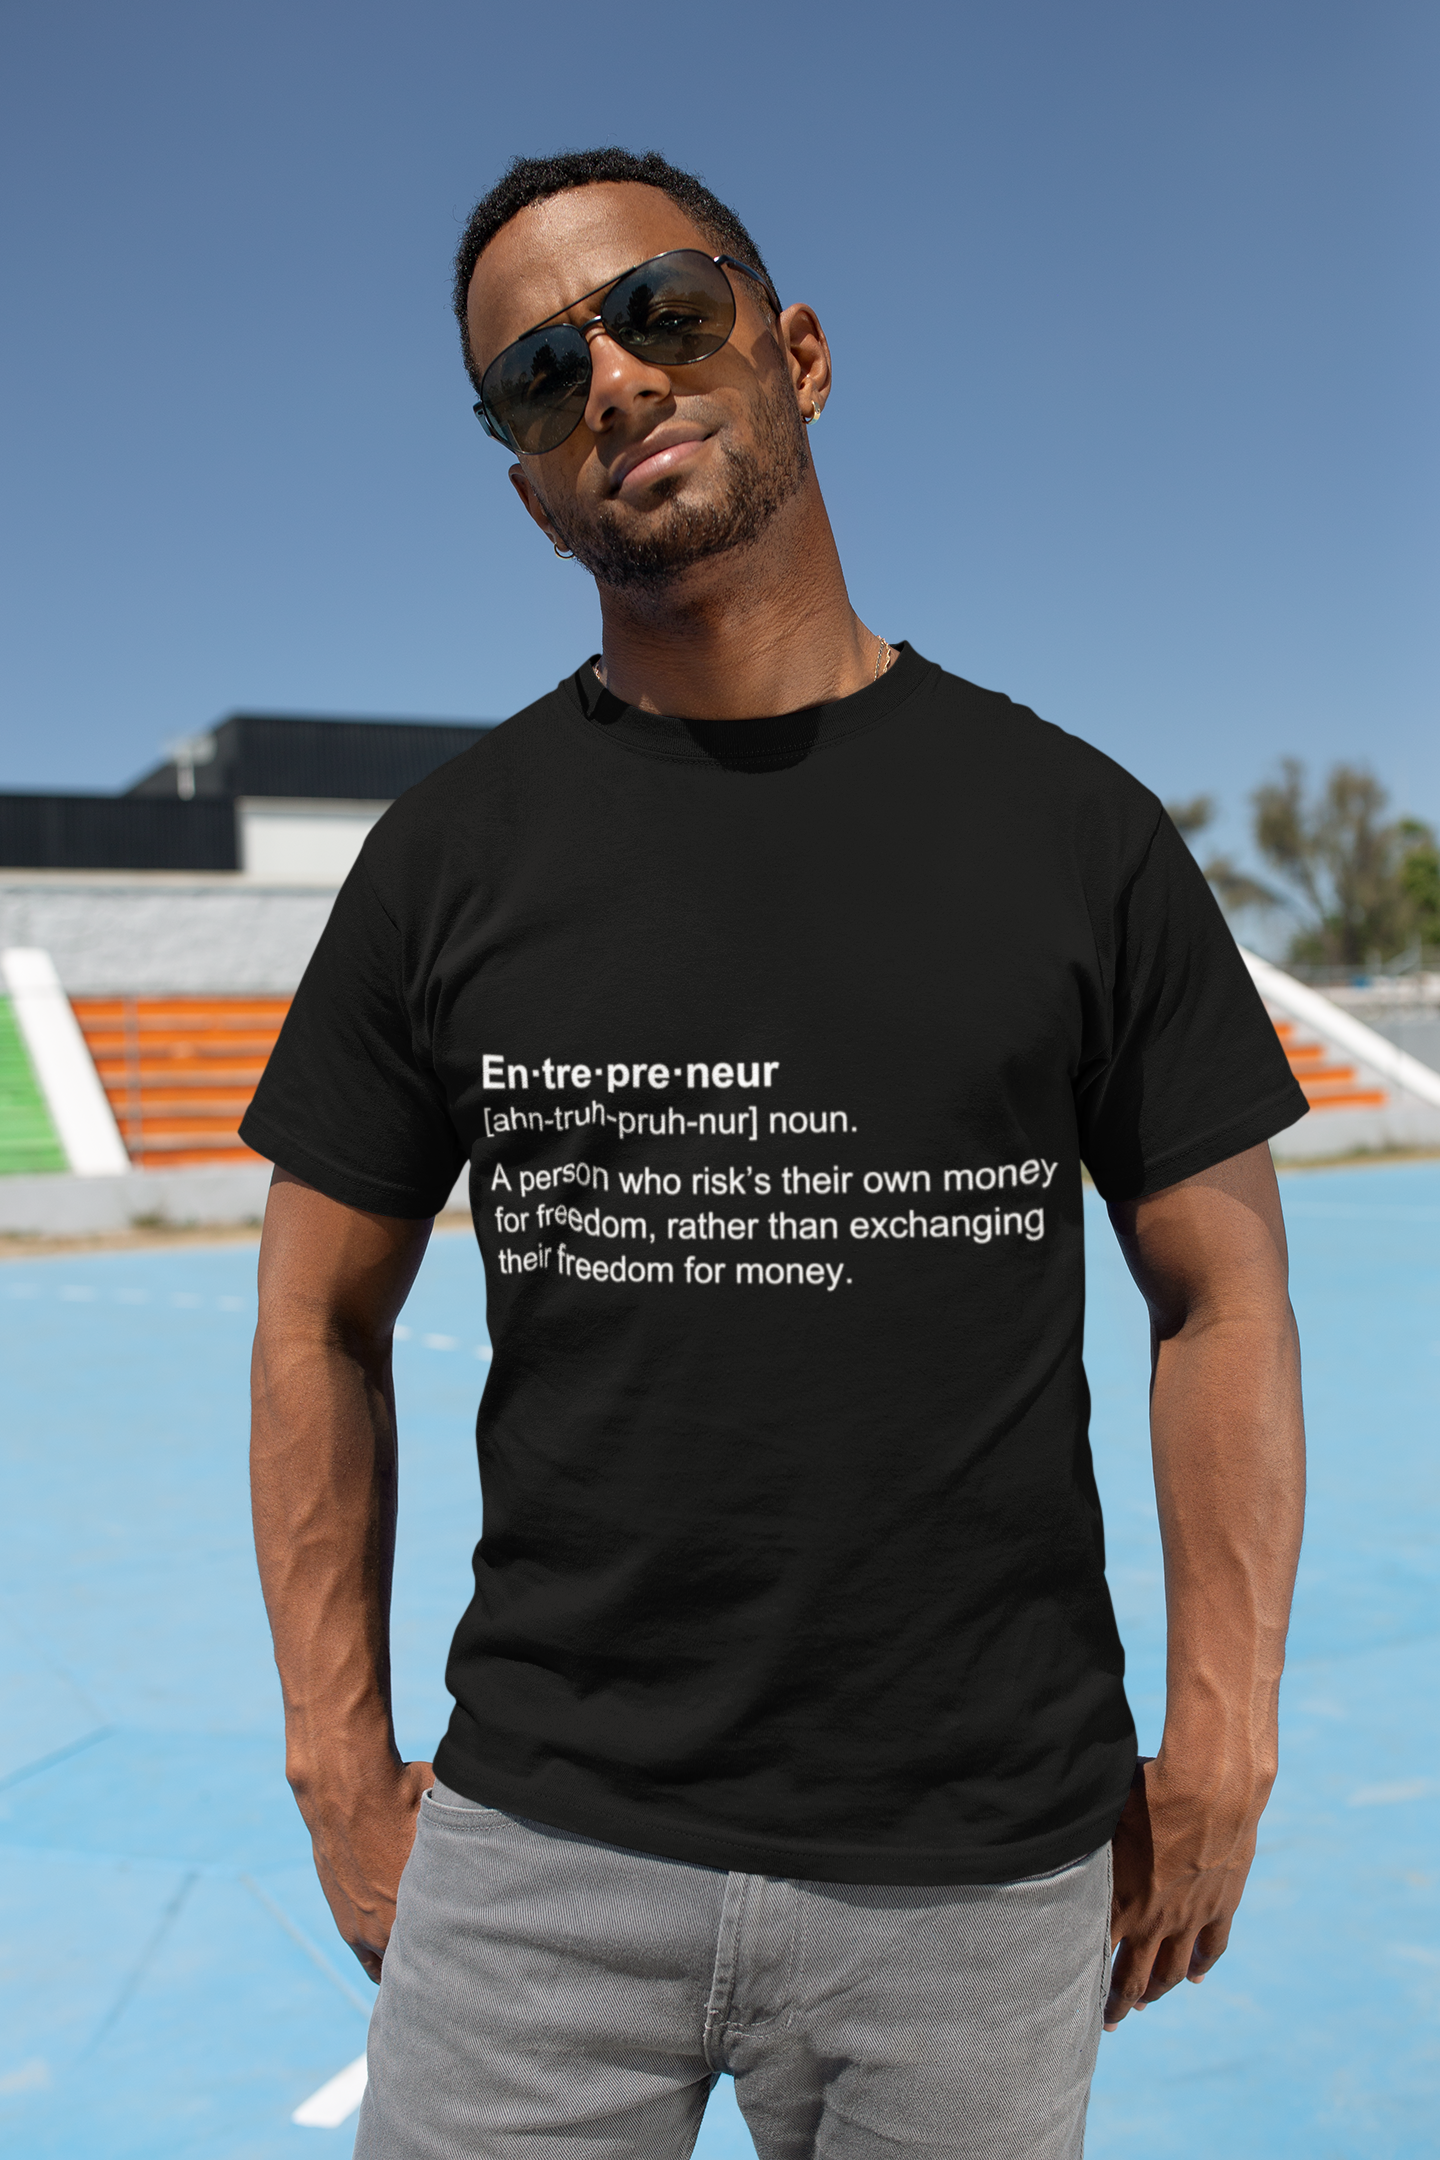 Entrepreneur Definition Tshirt